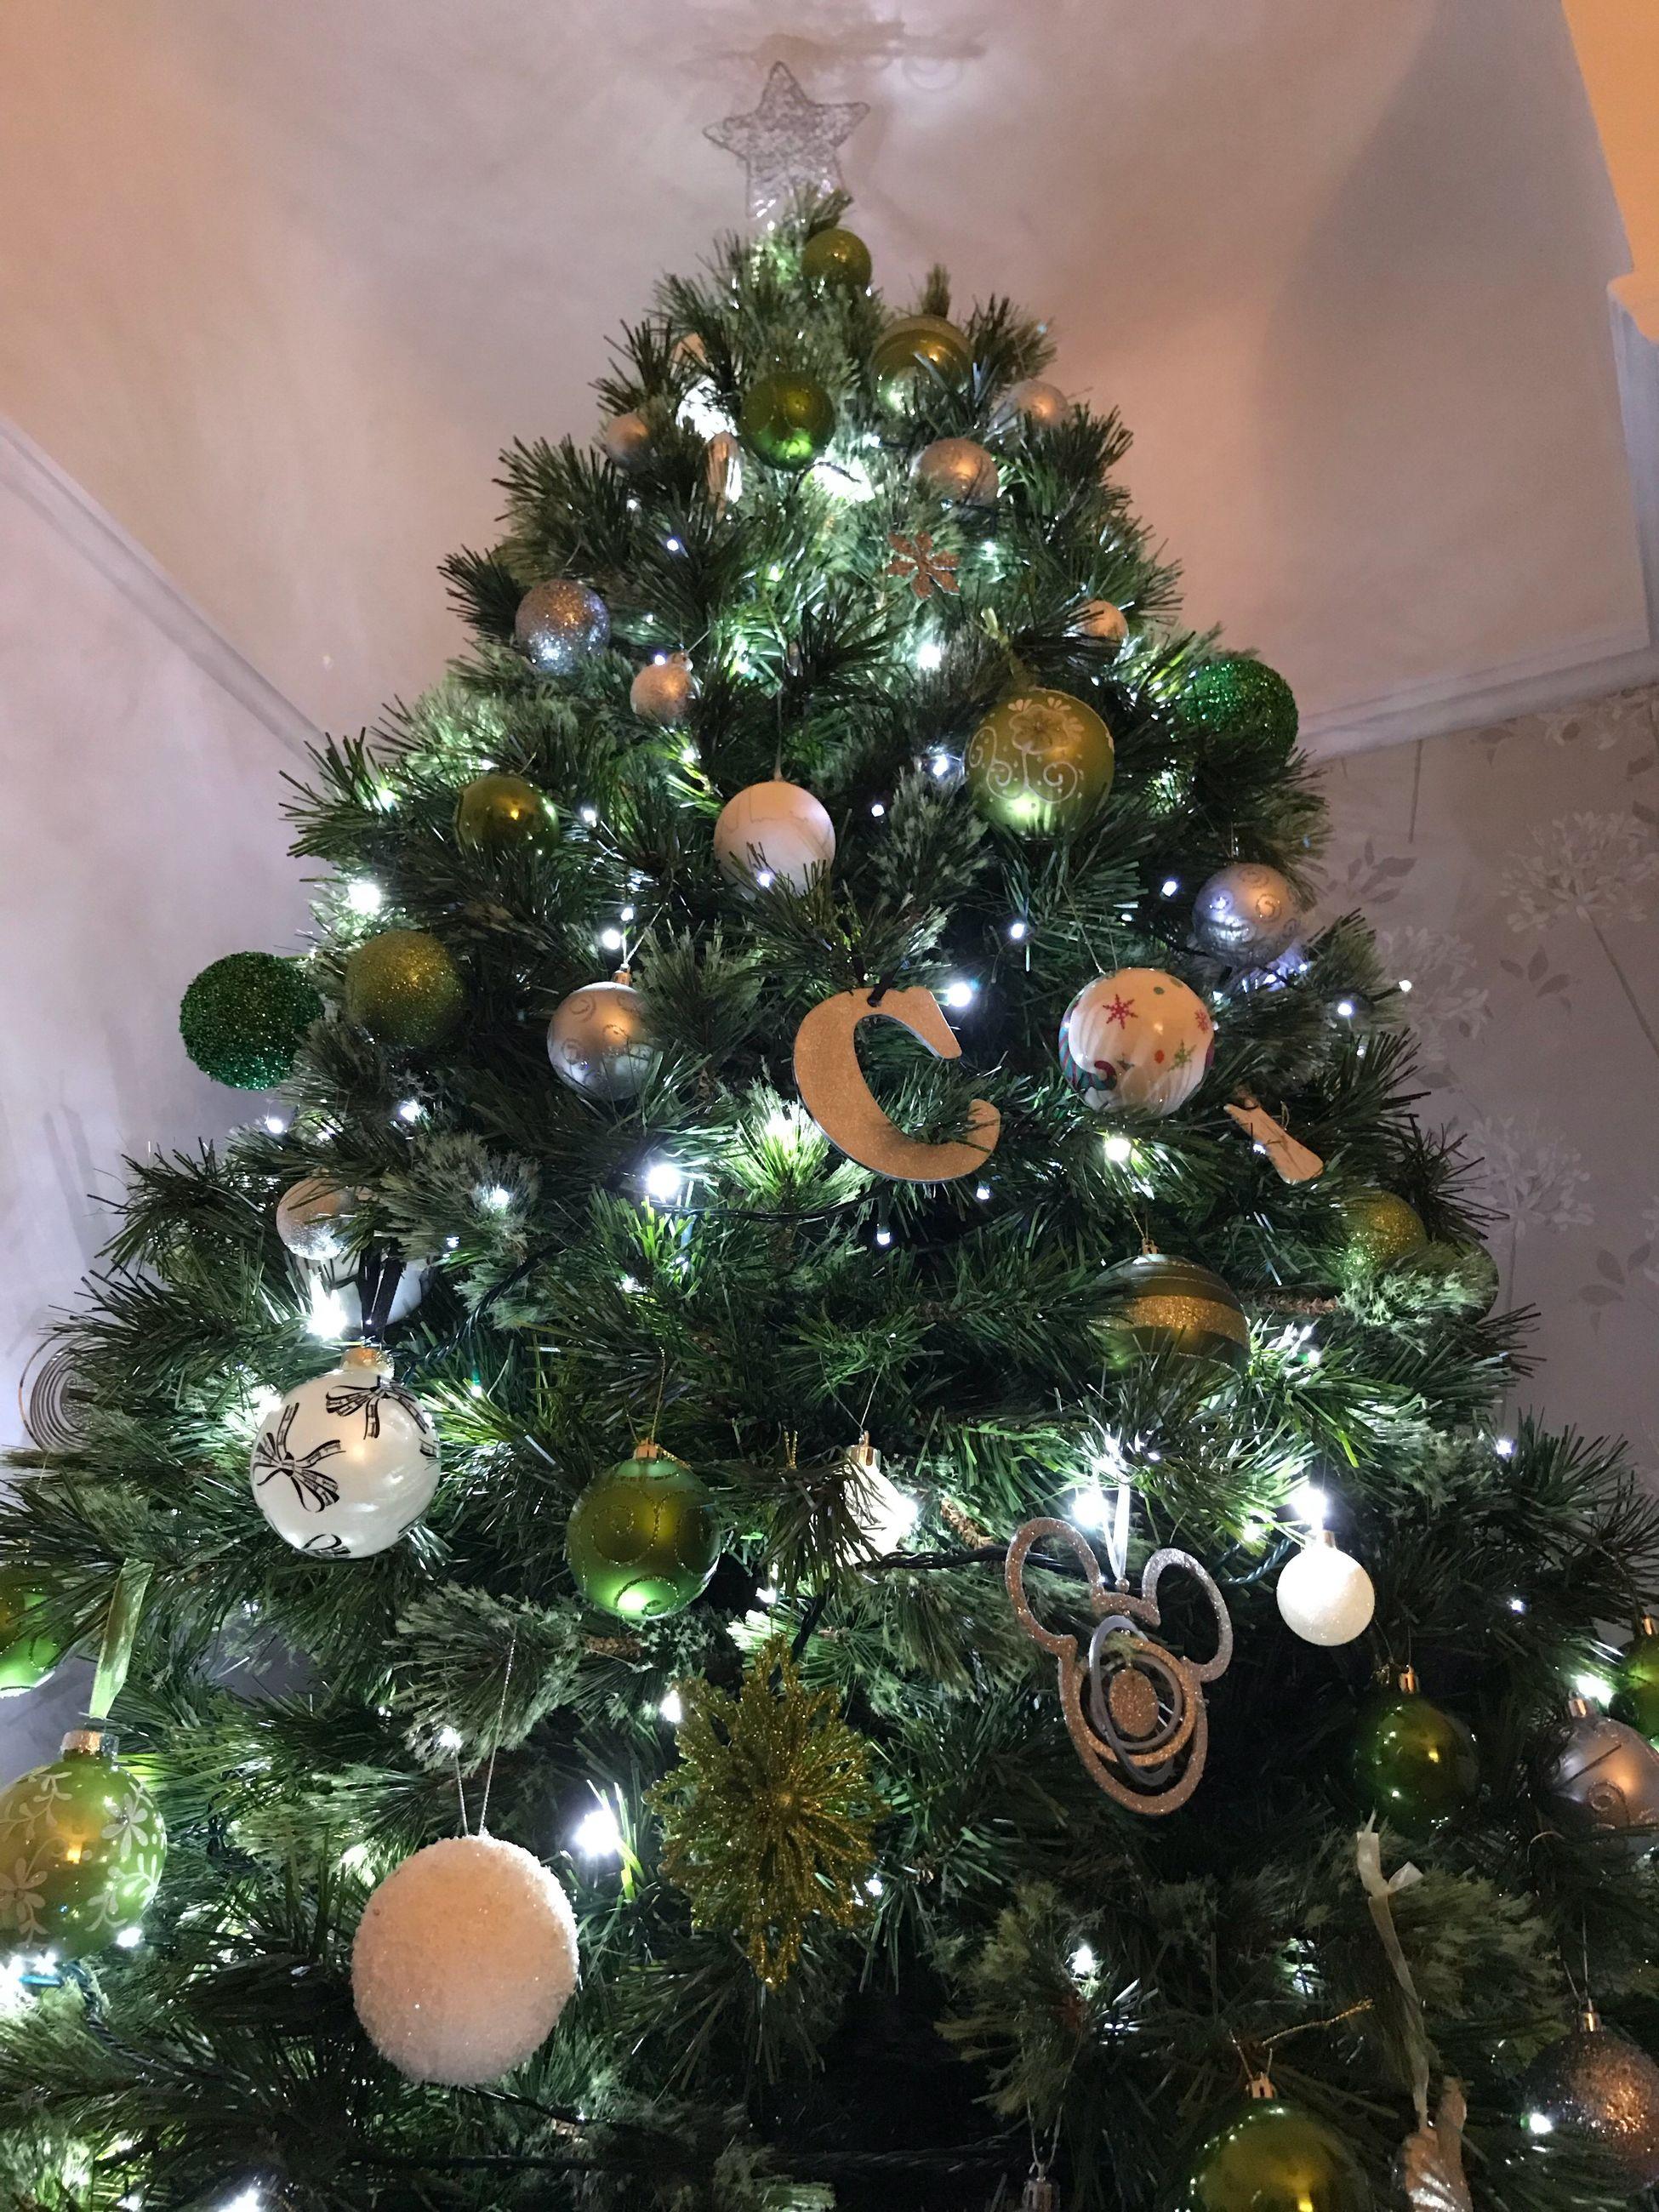 christmas, christmas tree, celebration, christmas decoration, tradition, christmas ornament, decoration, indoors, christmas bauble, celebration event, holiday - event, bauble, cultures, christmas lights, home interior, green color, no people, vacations, tree, close-up, illuminated, day